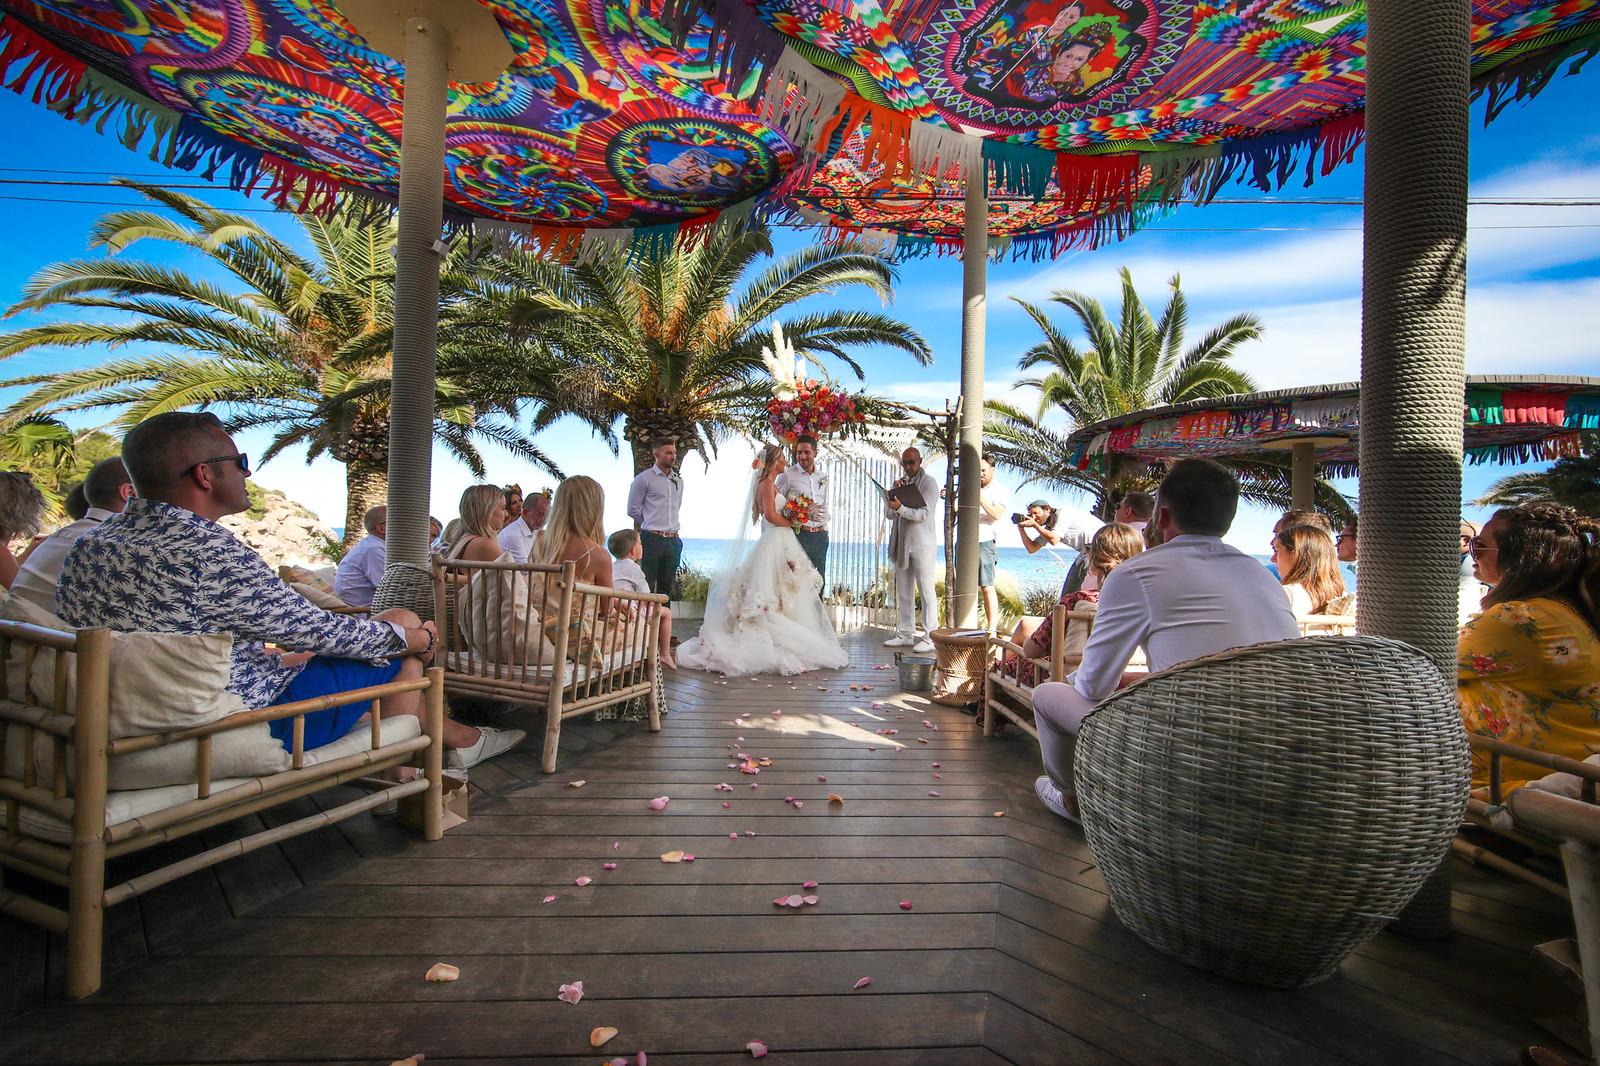 https://www.white-ibiza.com/wp-content/uploads/2020/03/white-ibiza-wedding-venue-aiyanna-2020-01.jpg